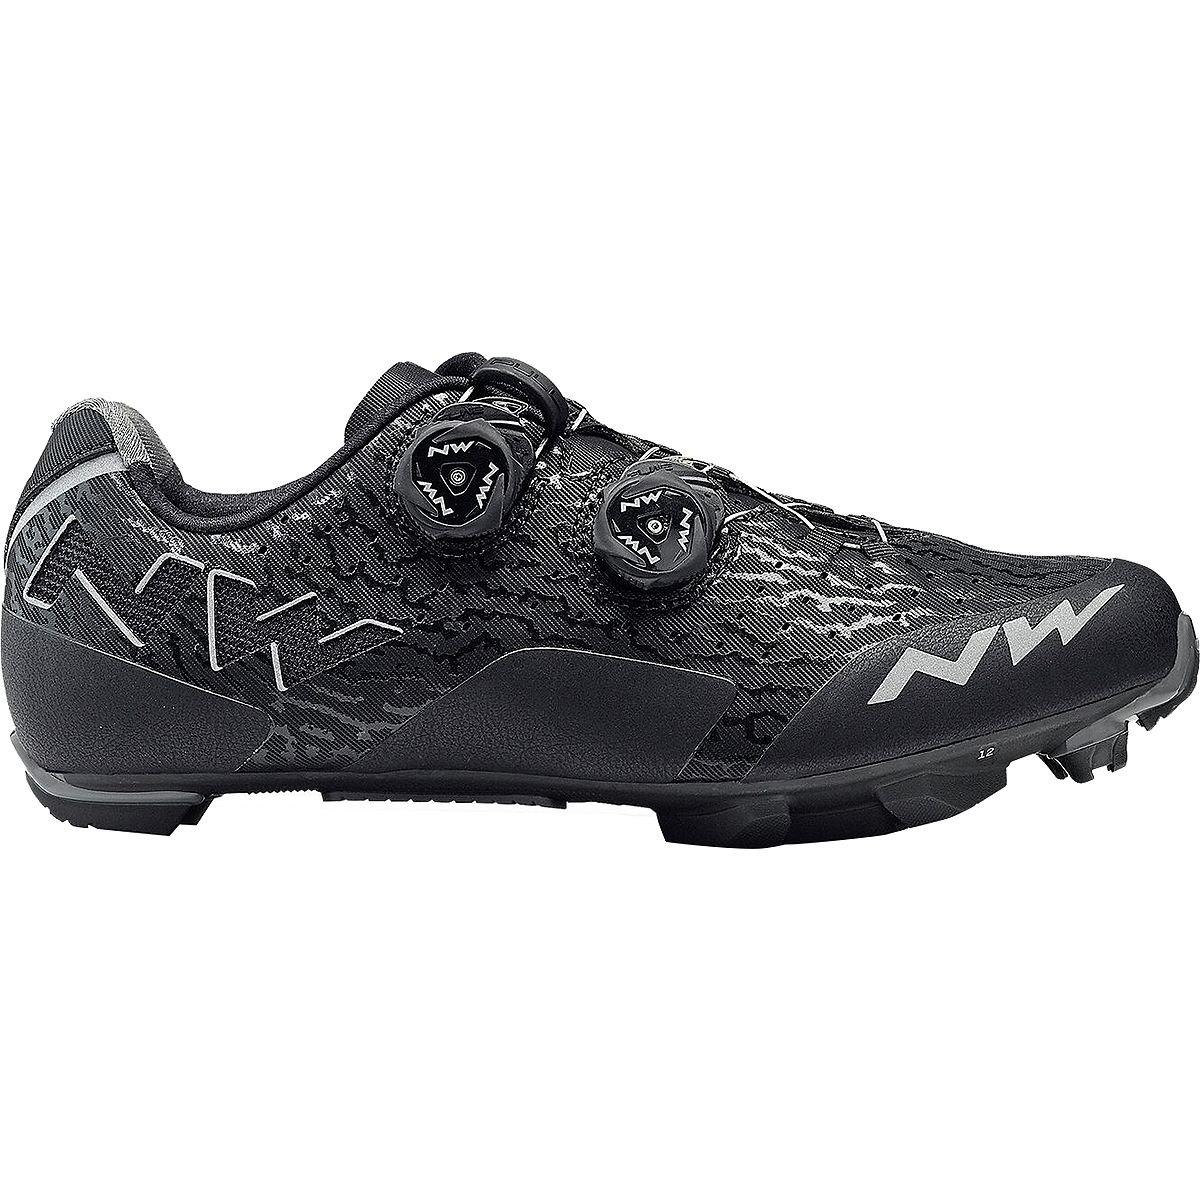 Northwave Rebel Cycling Shoe – Men 's 42 ブラック/アントラシート B07D3T4213